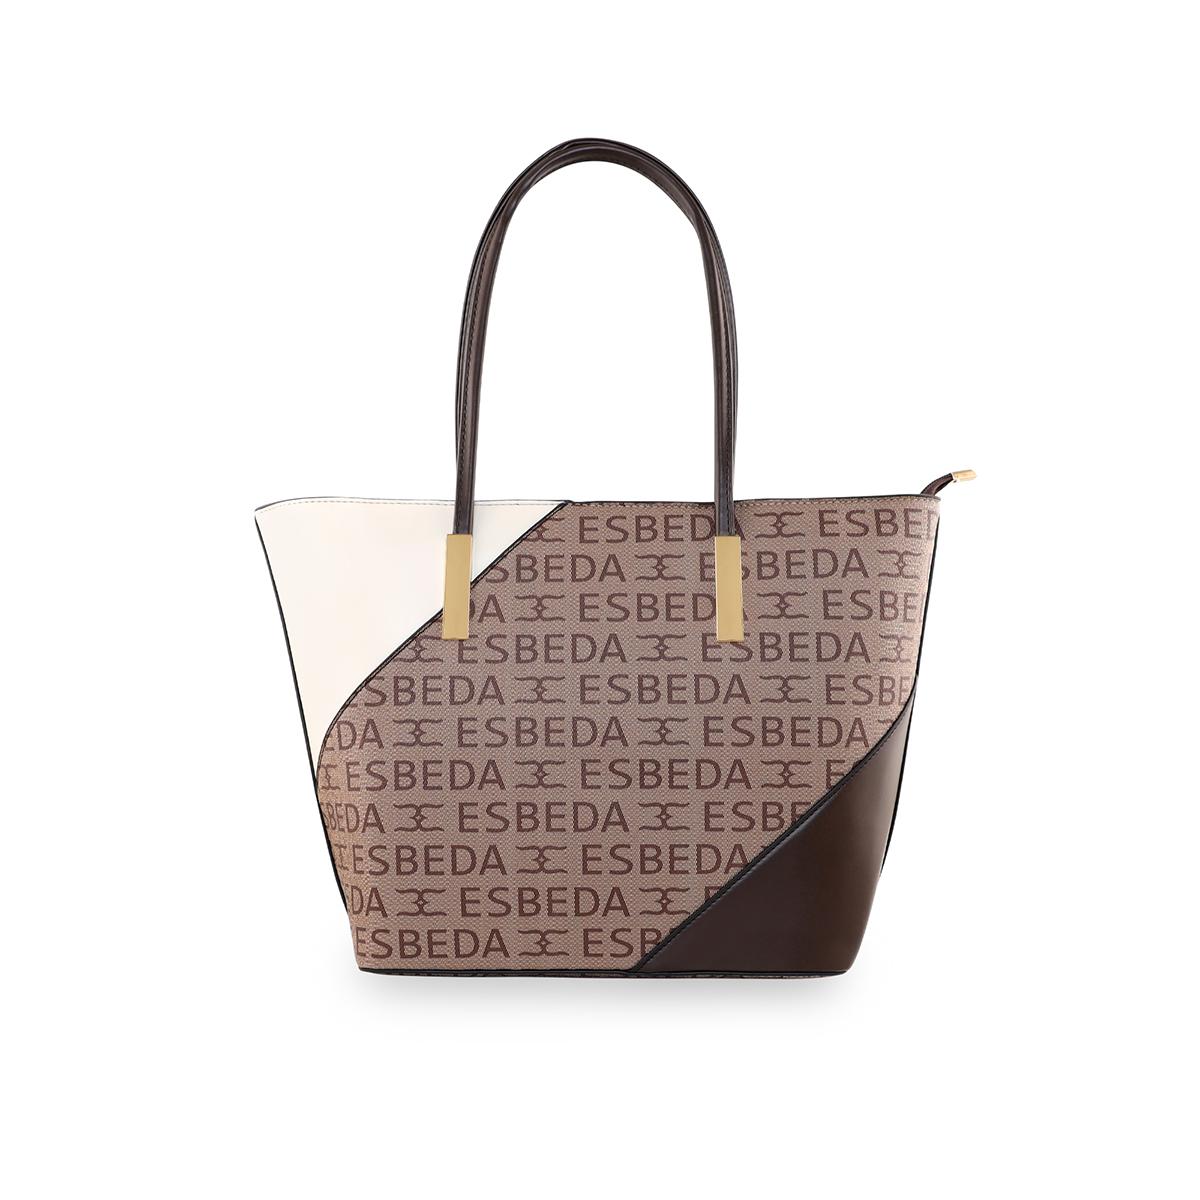 ESBEDA | ESBEDA Coffee Brown Color Logo Printed Basket Handbag For Women